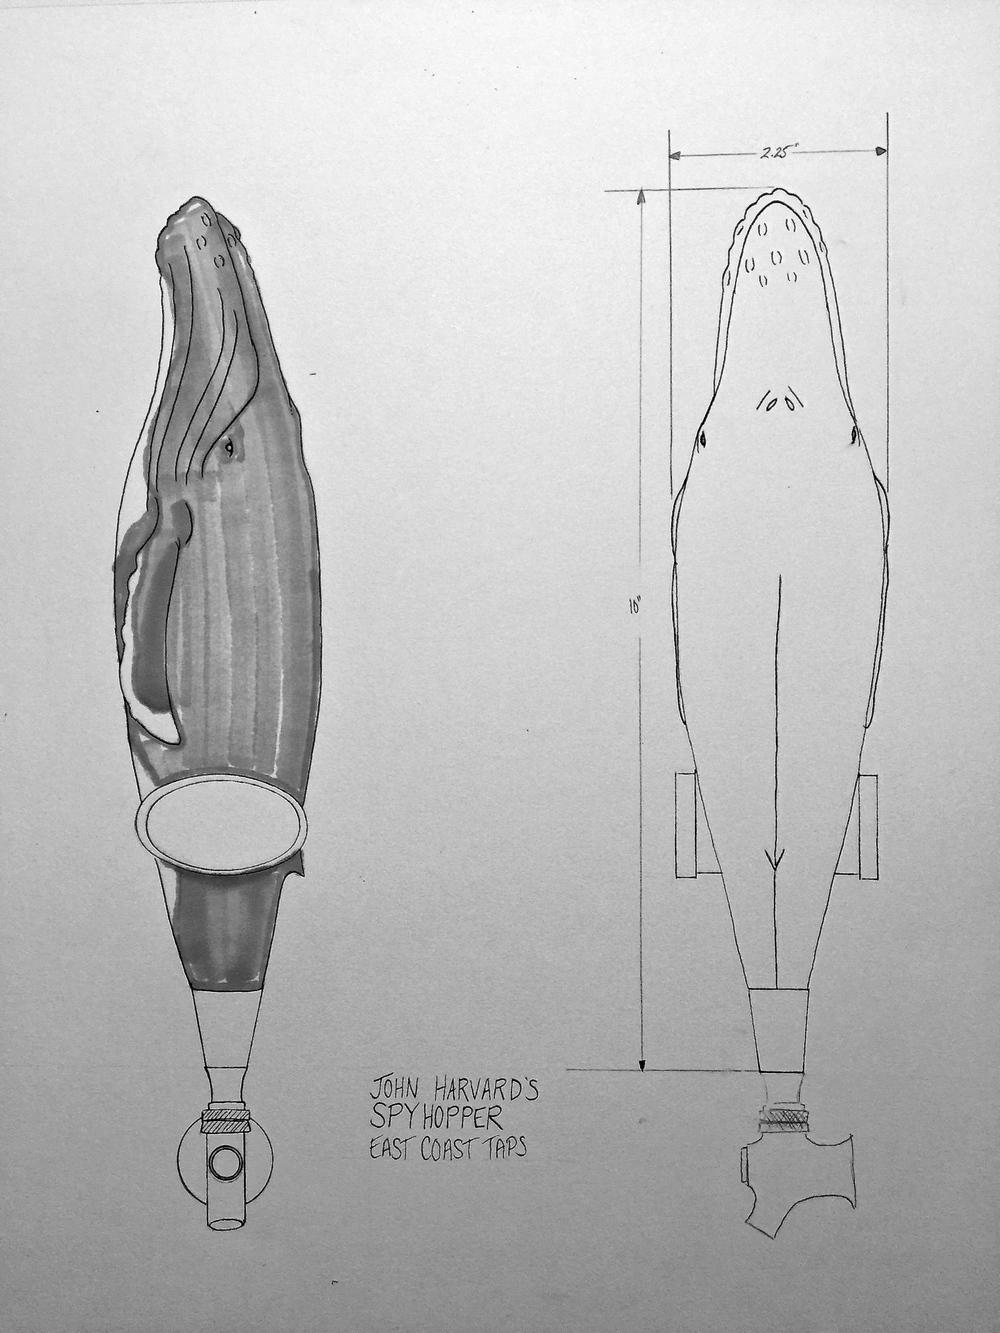 John Harvard's Final Whale Design.JPG